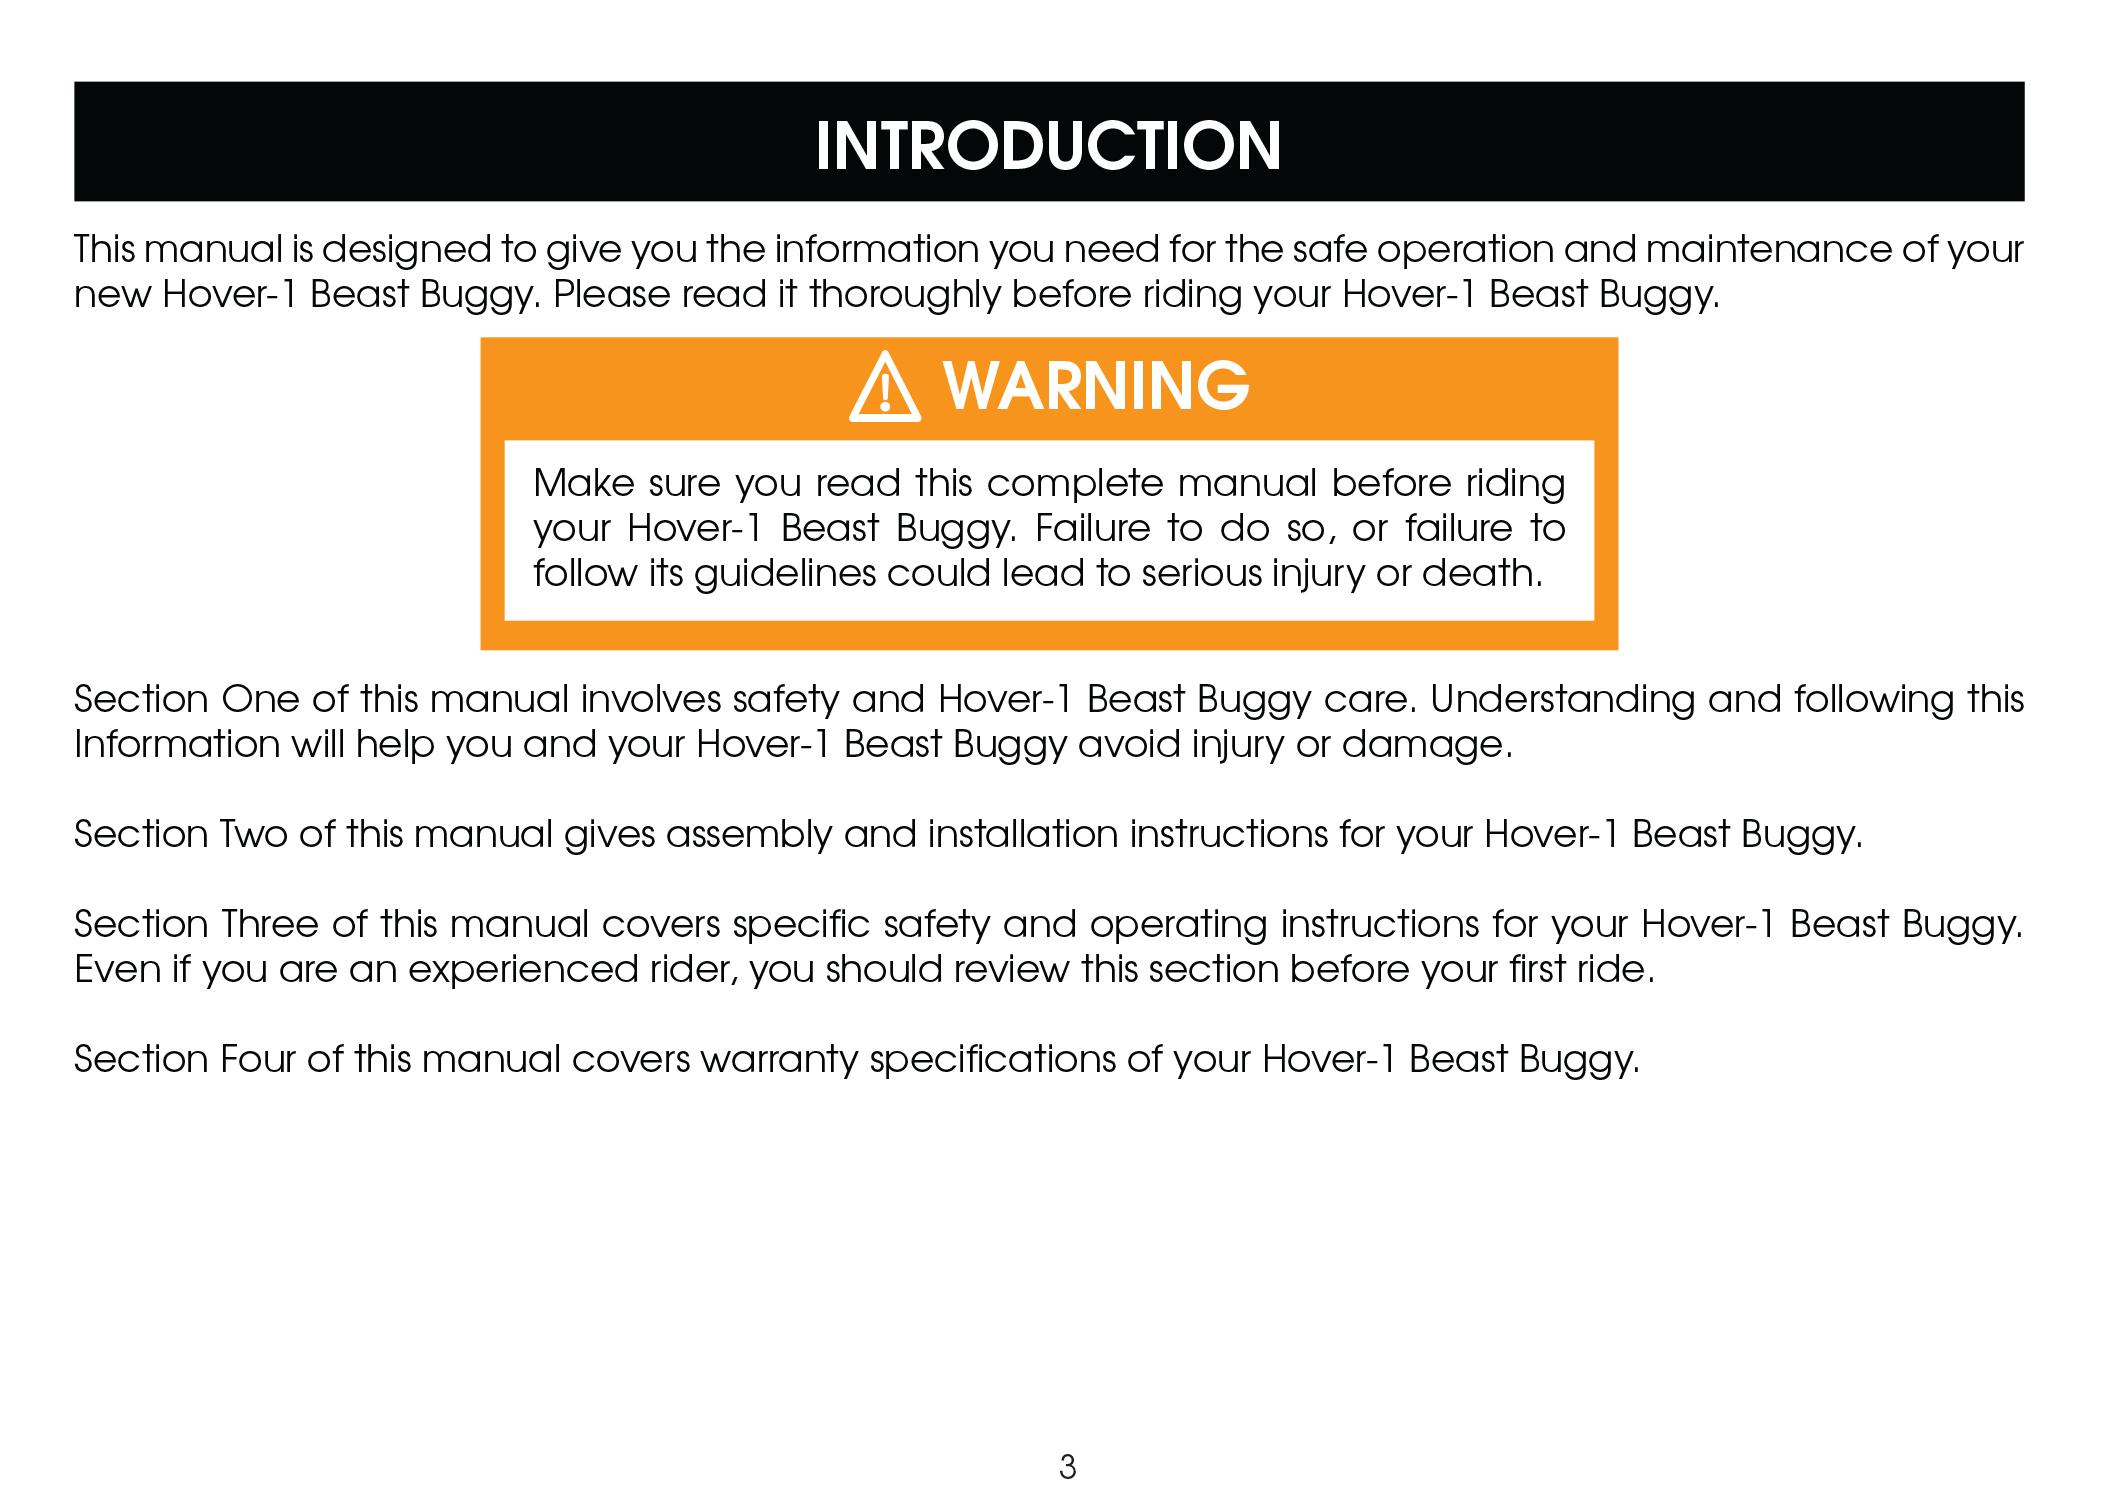 HY-BST-BGY-Manual-04232018-4.jpg